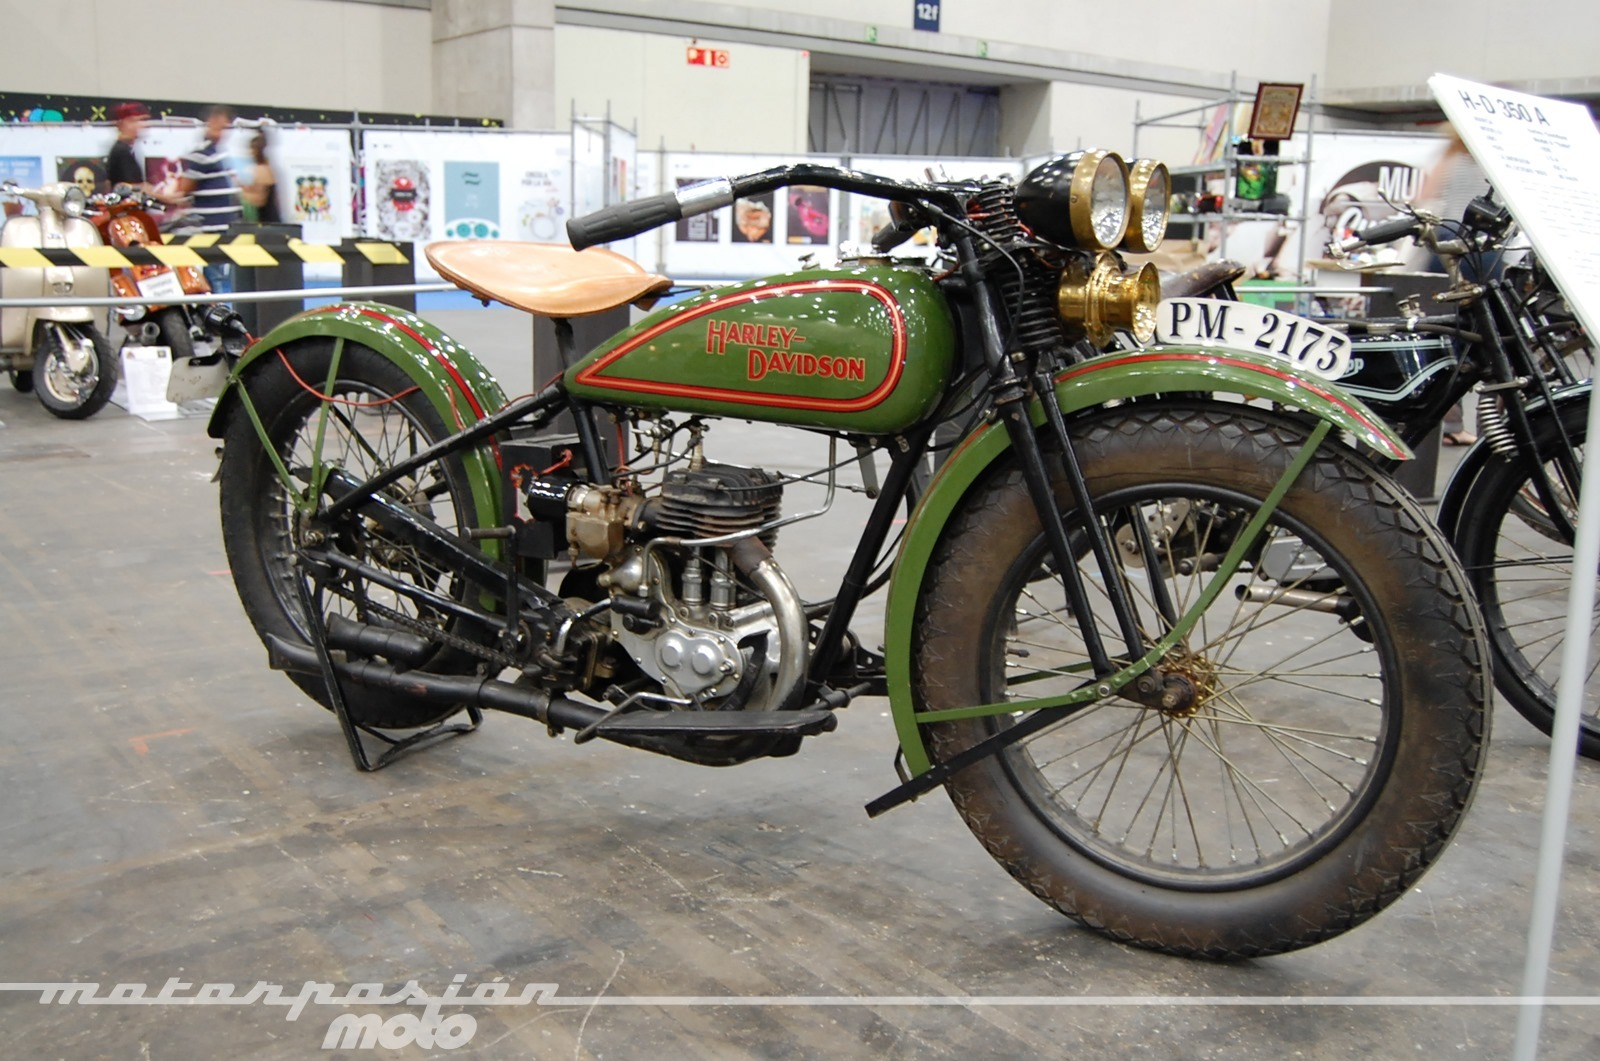 Foto de Mulafest 2014, exposición de motos clásicas (33/35)